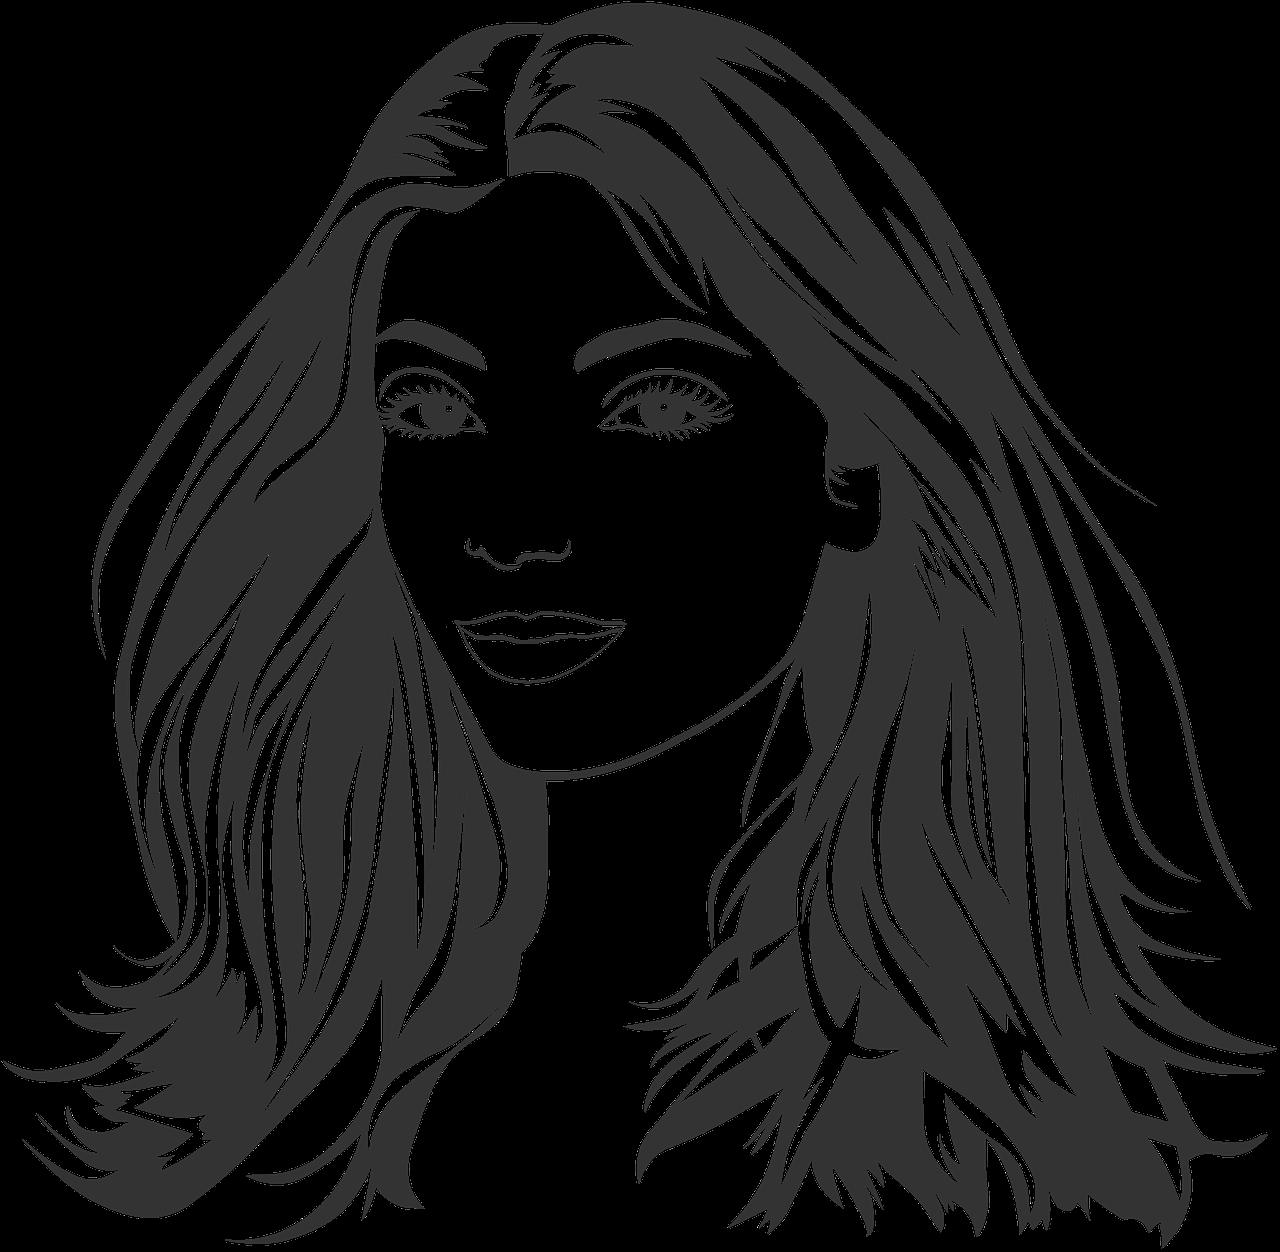 Gambar Kartun Wanita Rambut Panjang Gadis Wanita Rambut Panjang Muda Gambar Gratis Di Pixabay